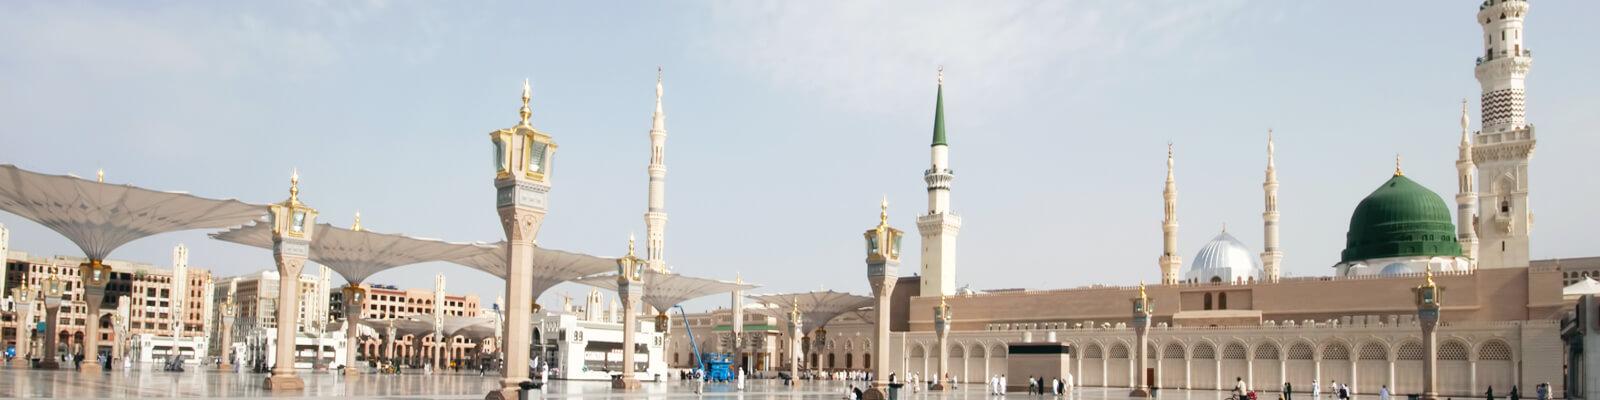 Cost Of Umrah Visa Fees 2019 2020: 14 Nights 5 Star December Umrah Package